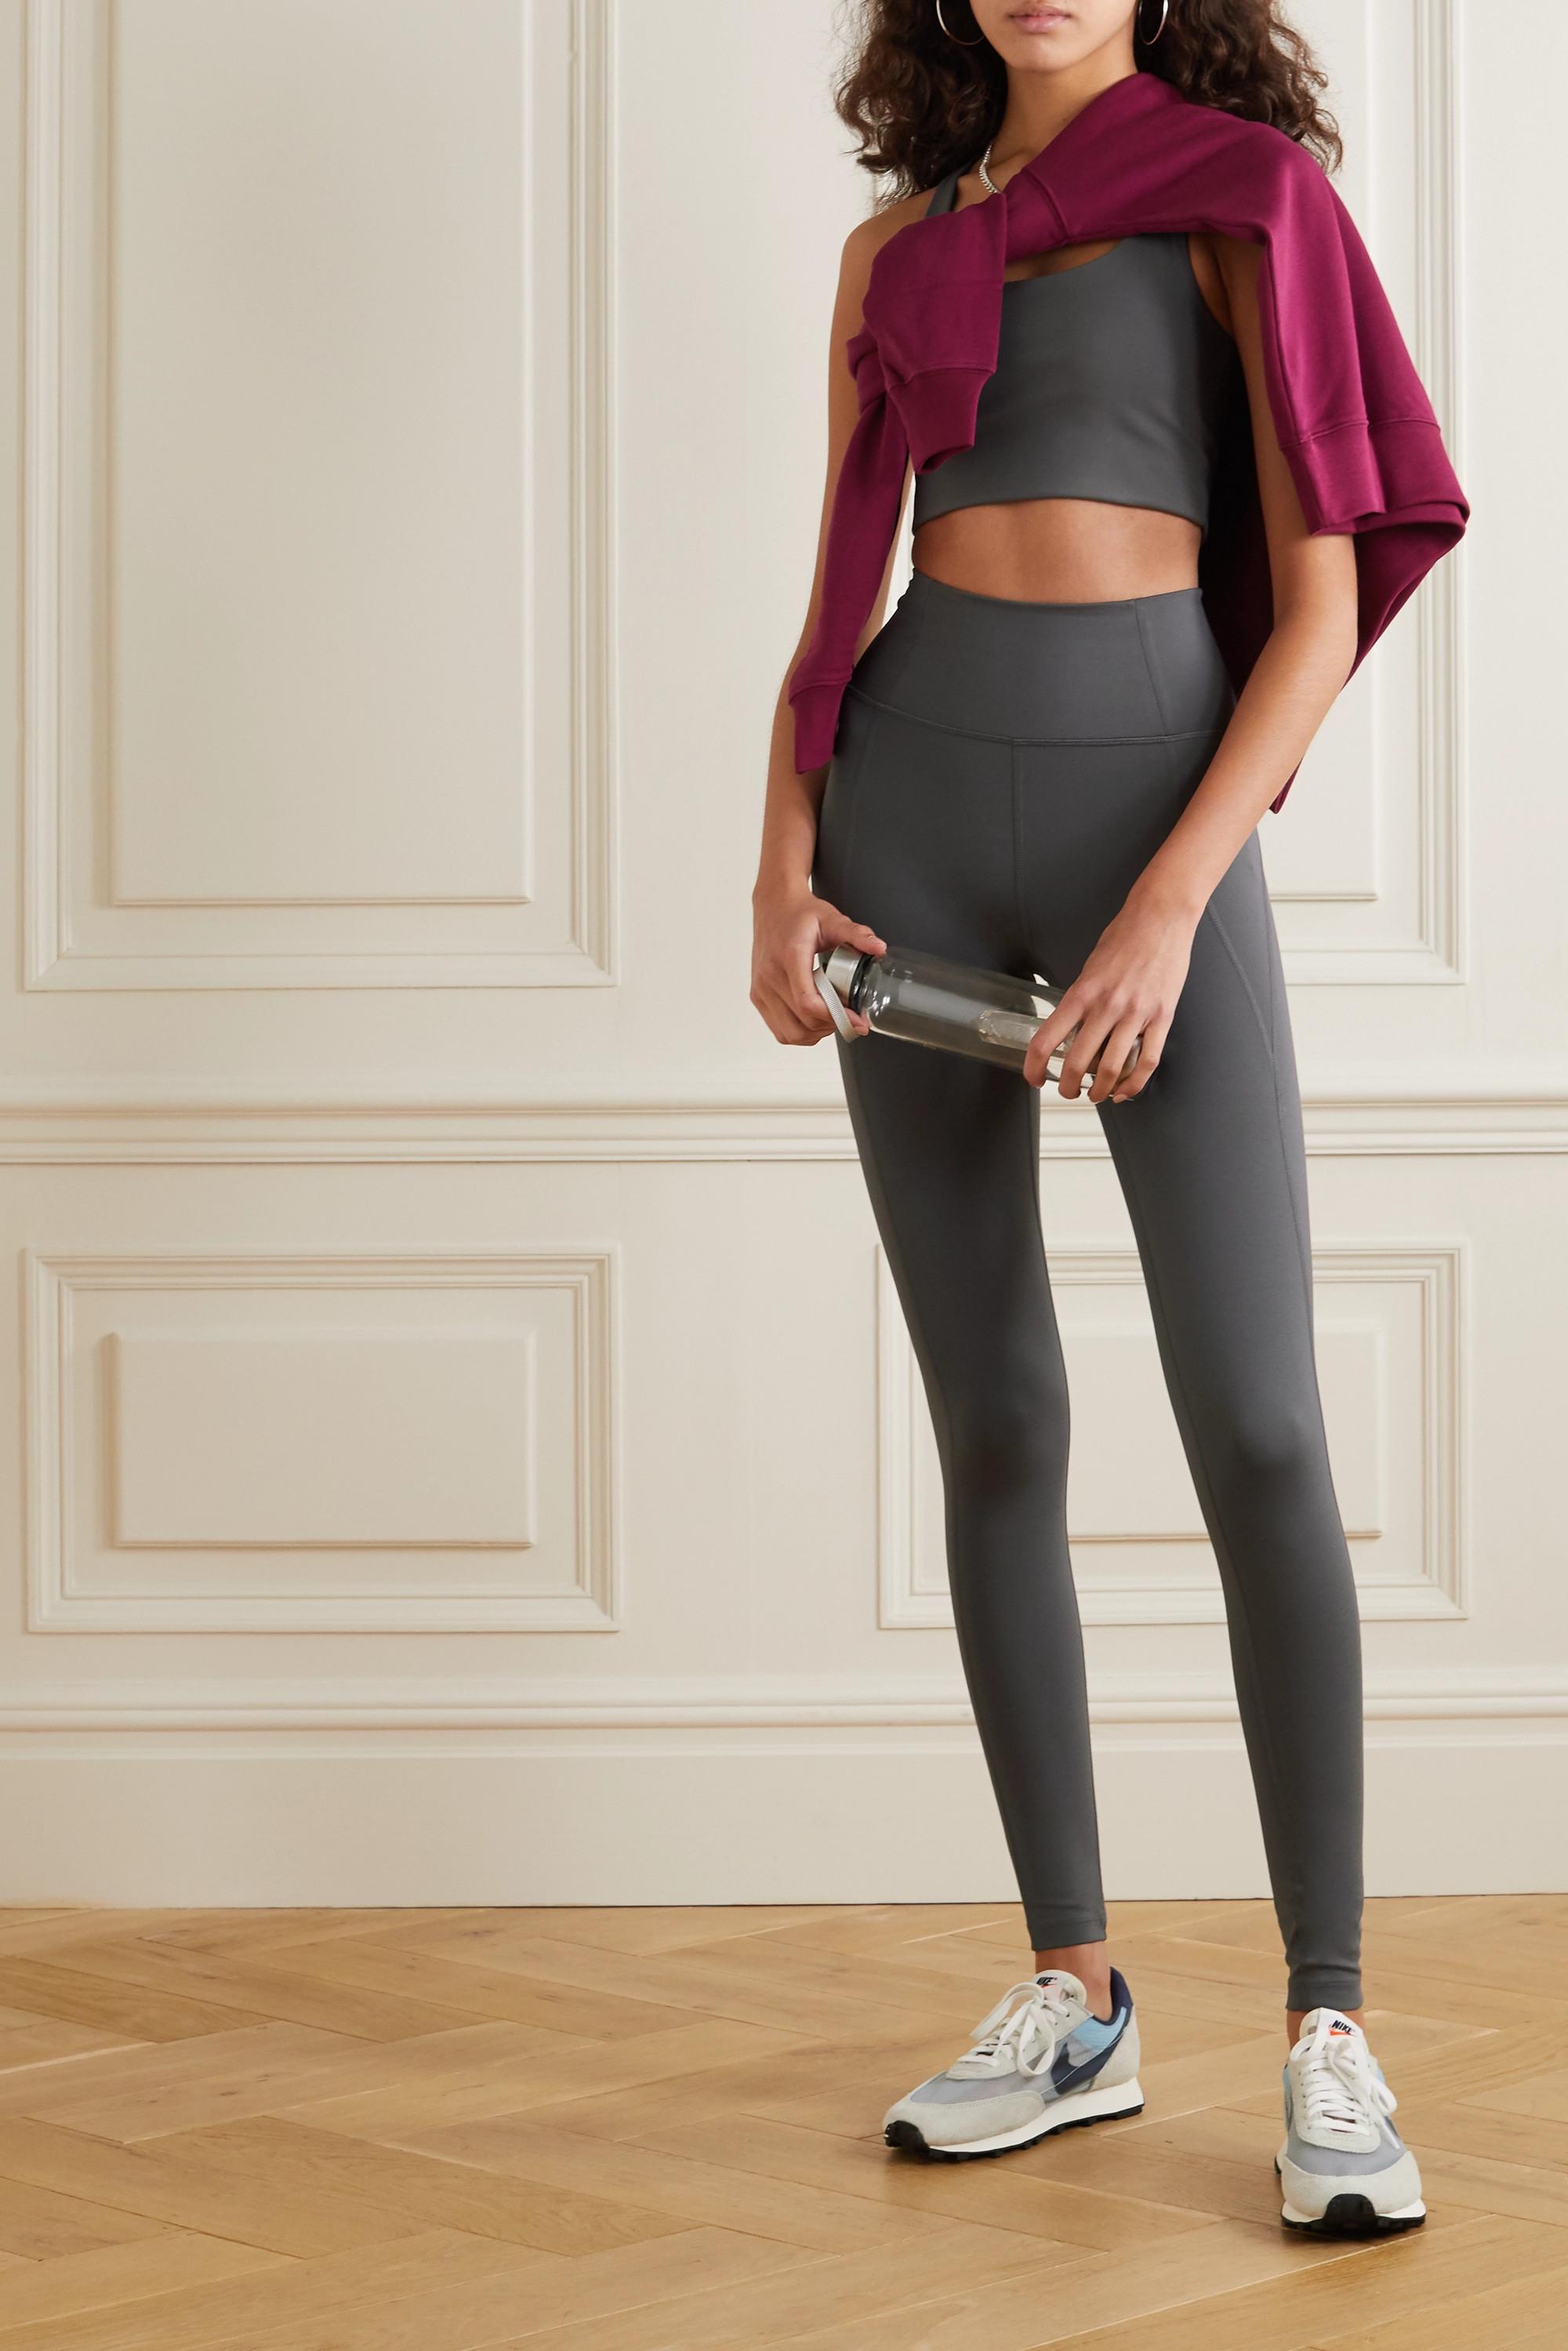 Girlfriend Collective + NET SUSTAIN Compressive stretch leggings